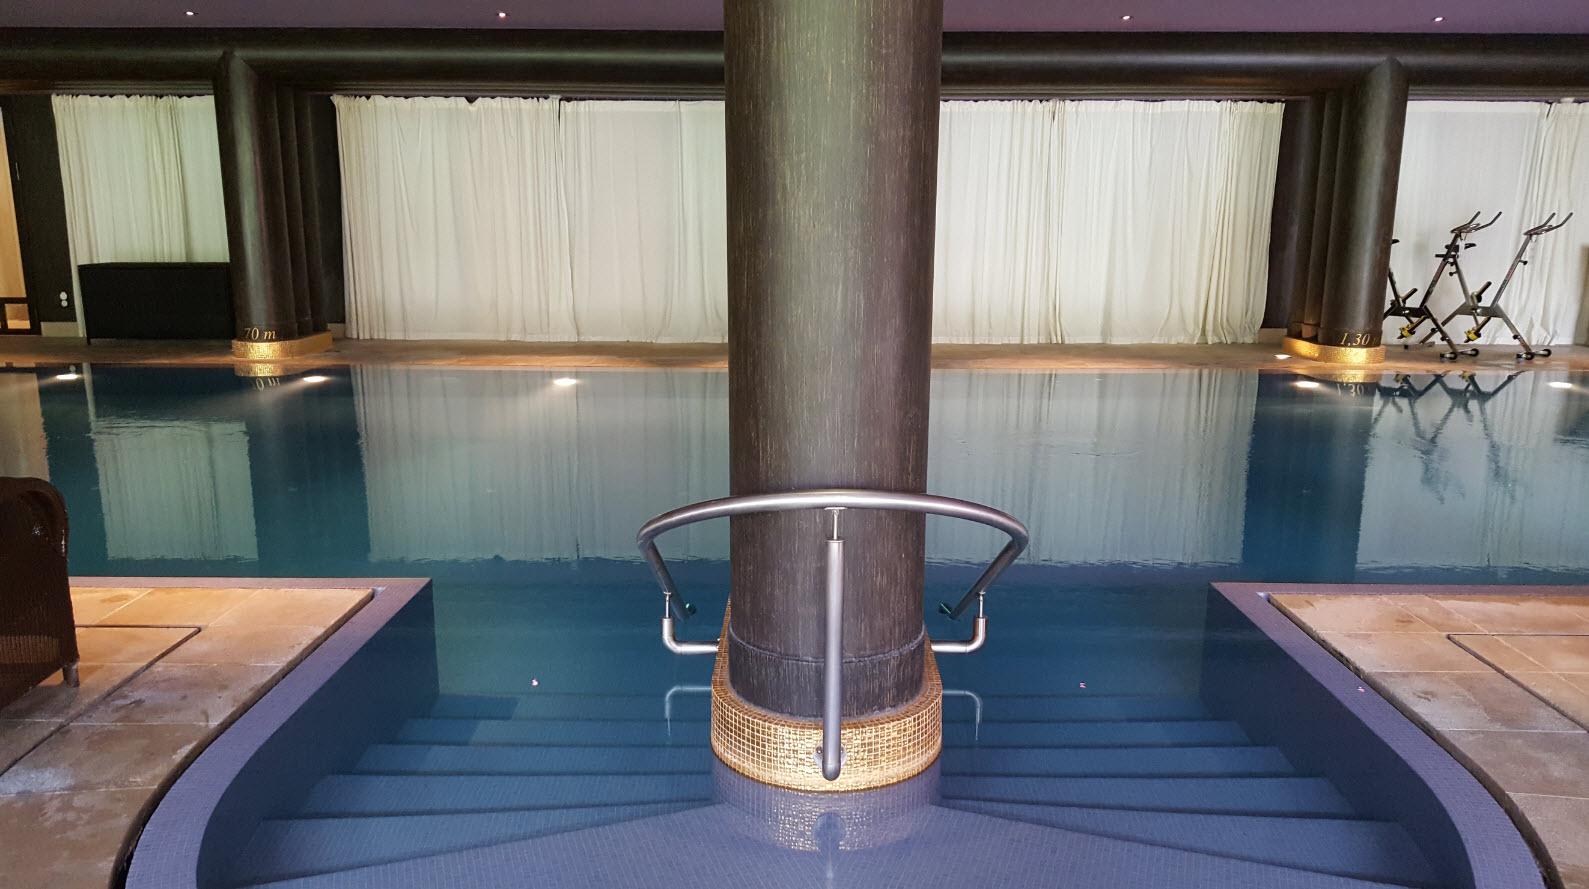 Piscine interieure de l'hotel